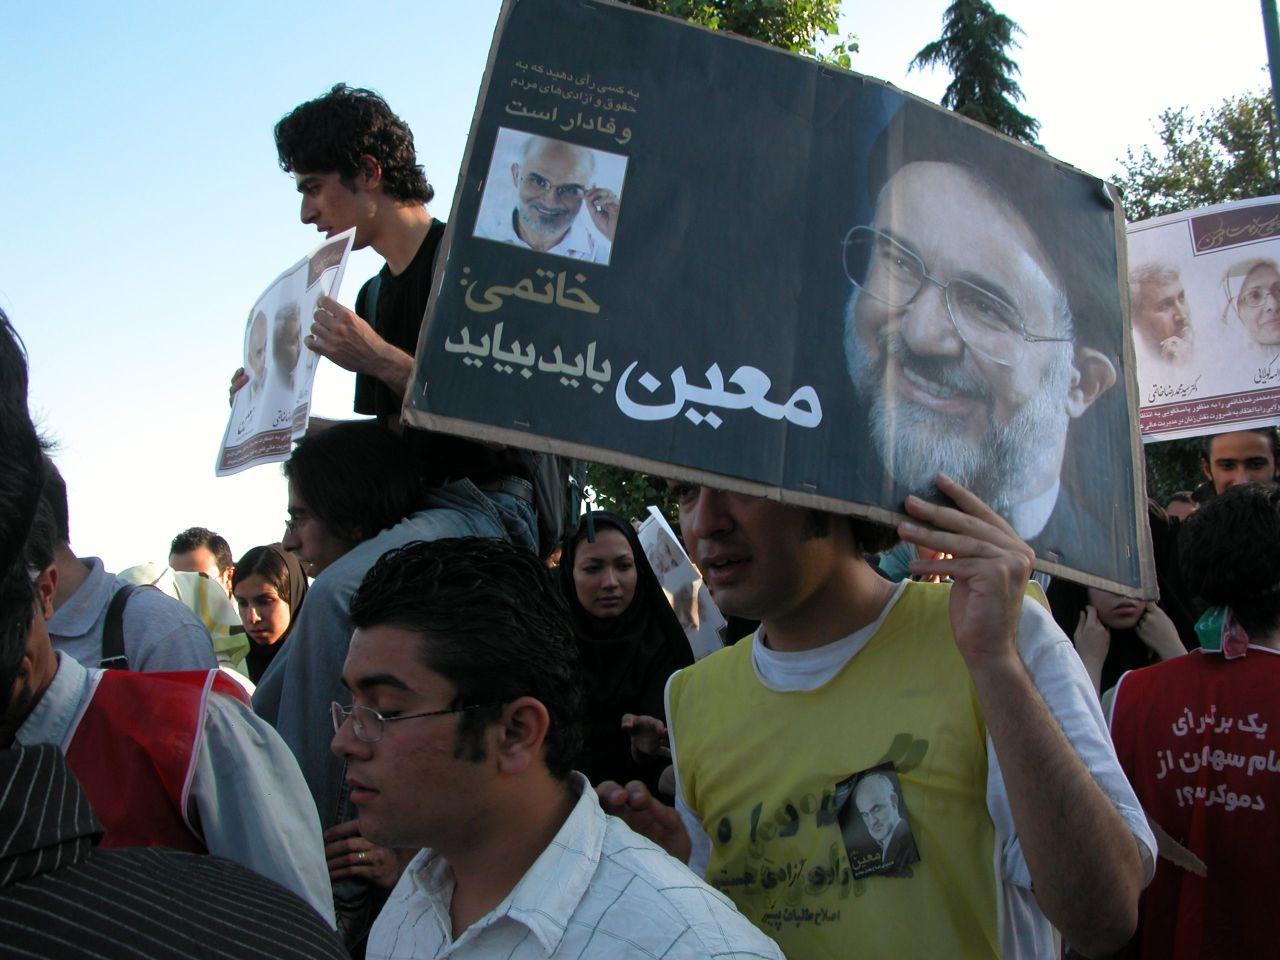 Communication, Media, and Popular Culture in Post-revolutionary Iran